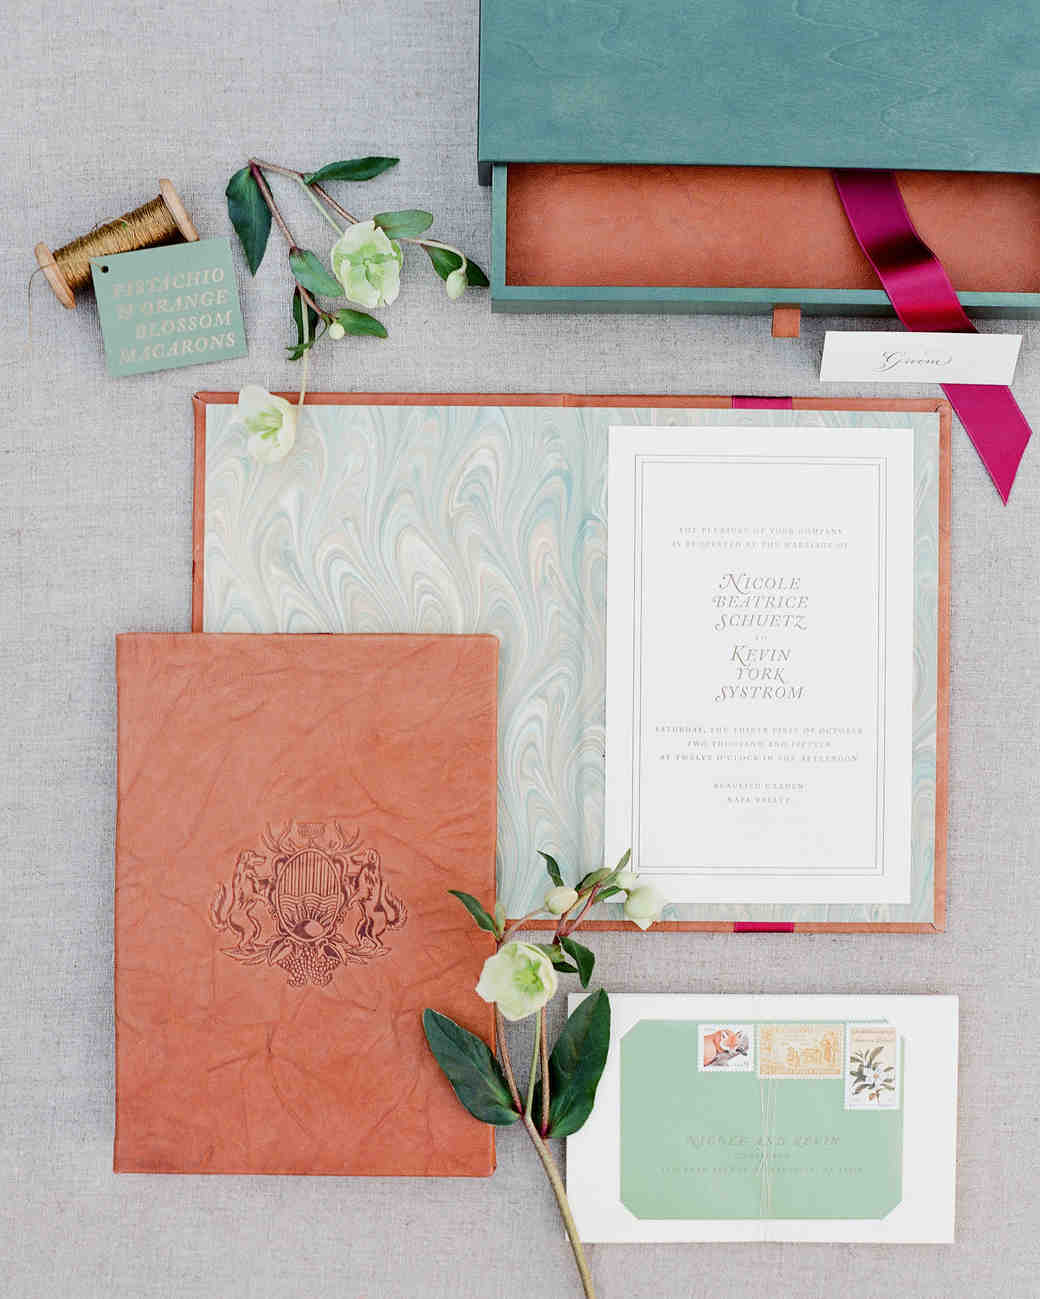 Trending Now: Boxed Wedding Invitations | Martha Stewart Weddings